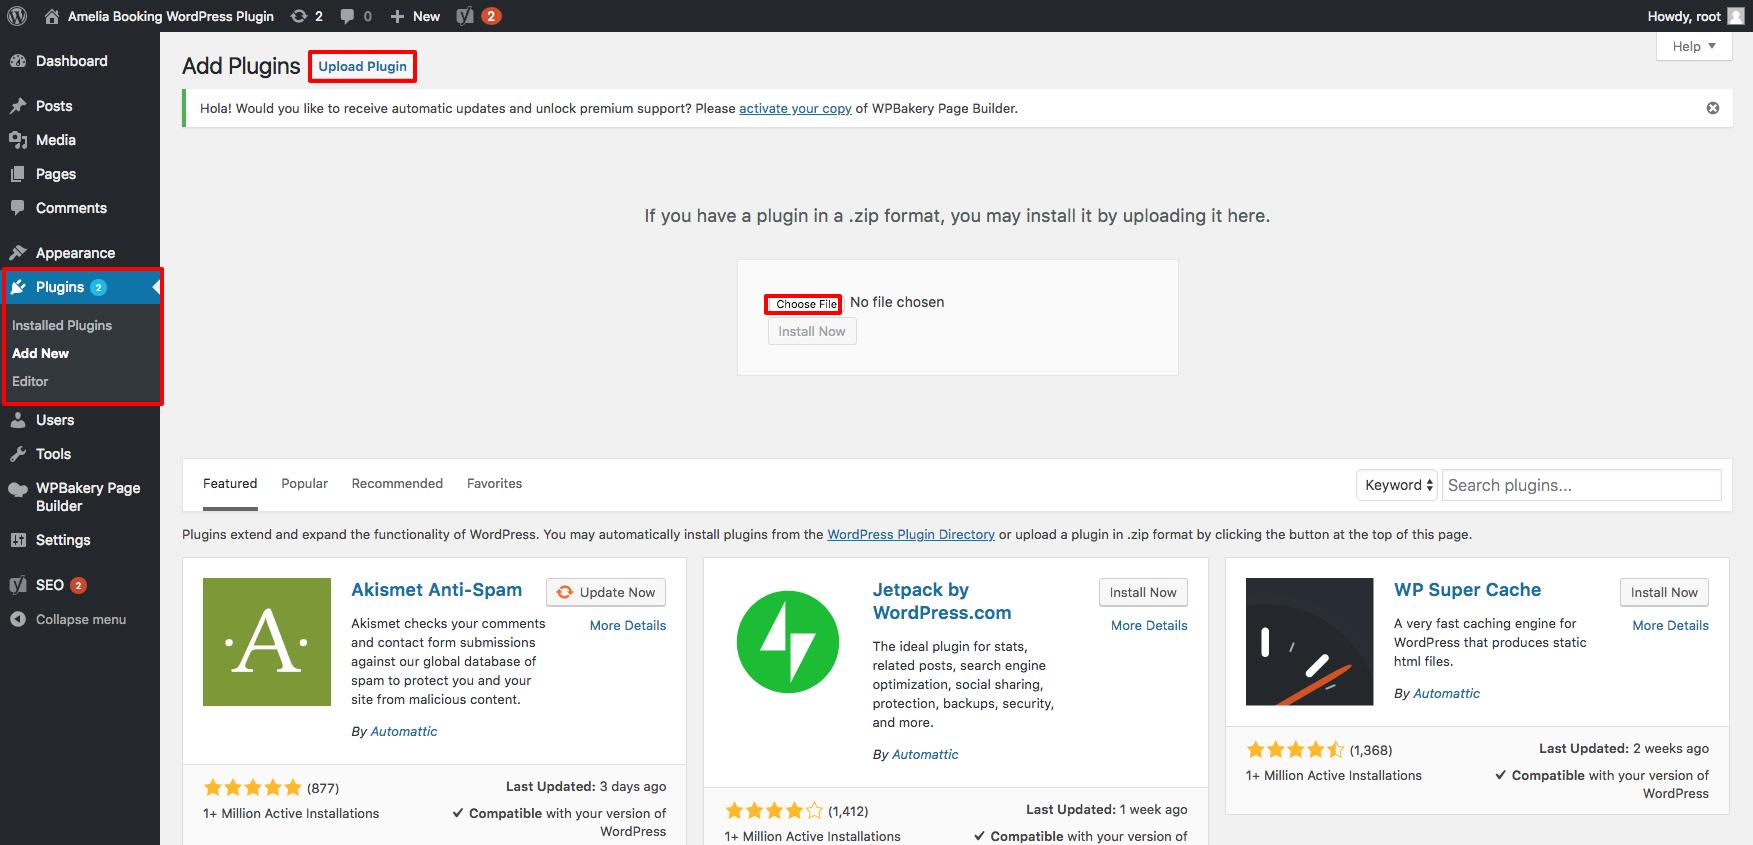 Installing - Amelia Booking WordPress Plugin